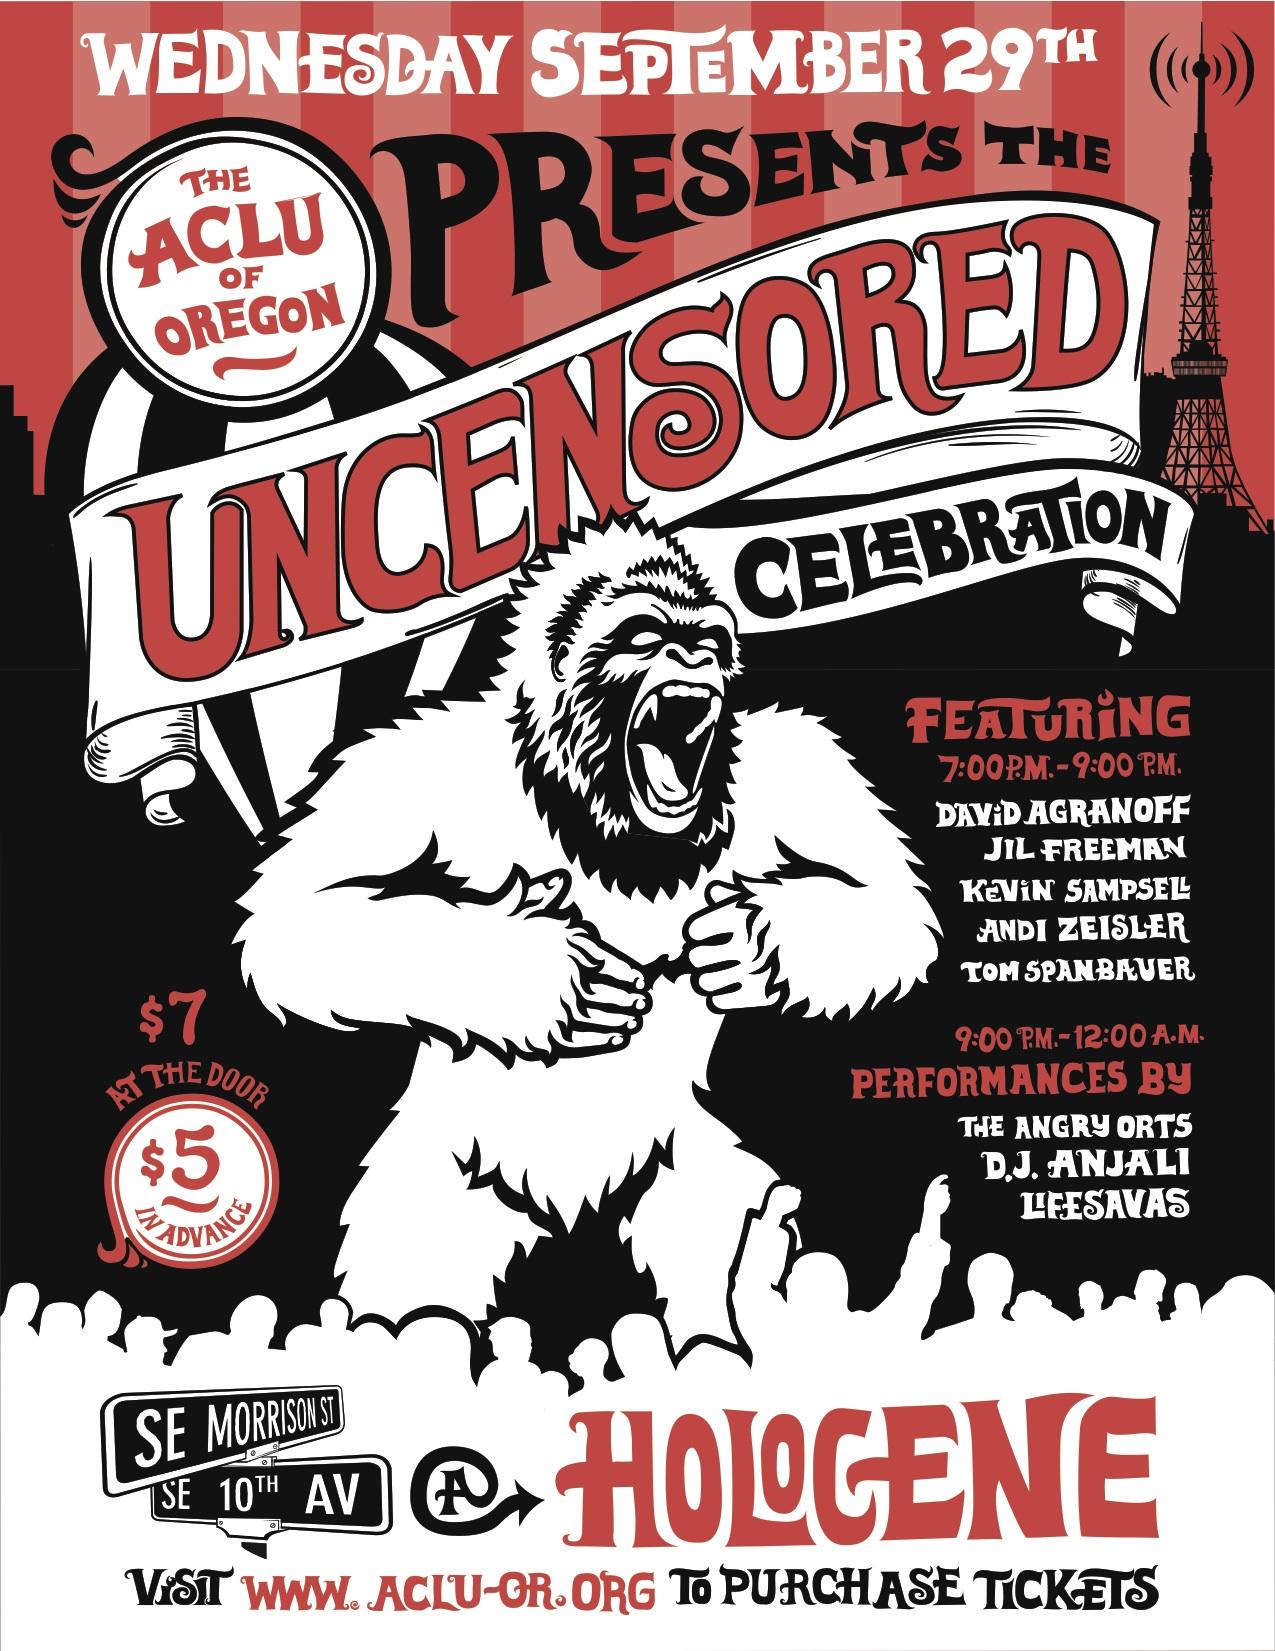 Uncensored Celebration 2010